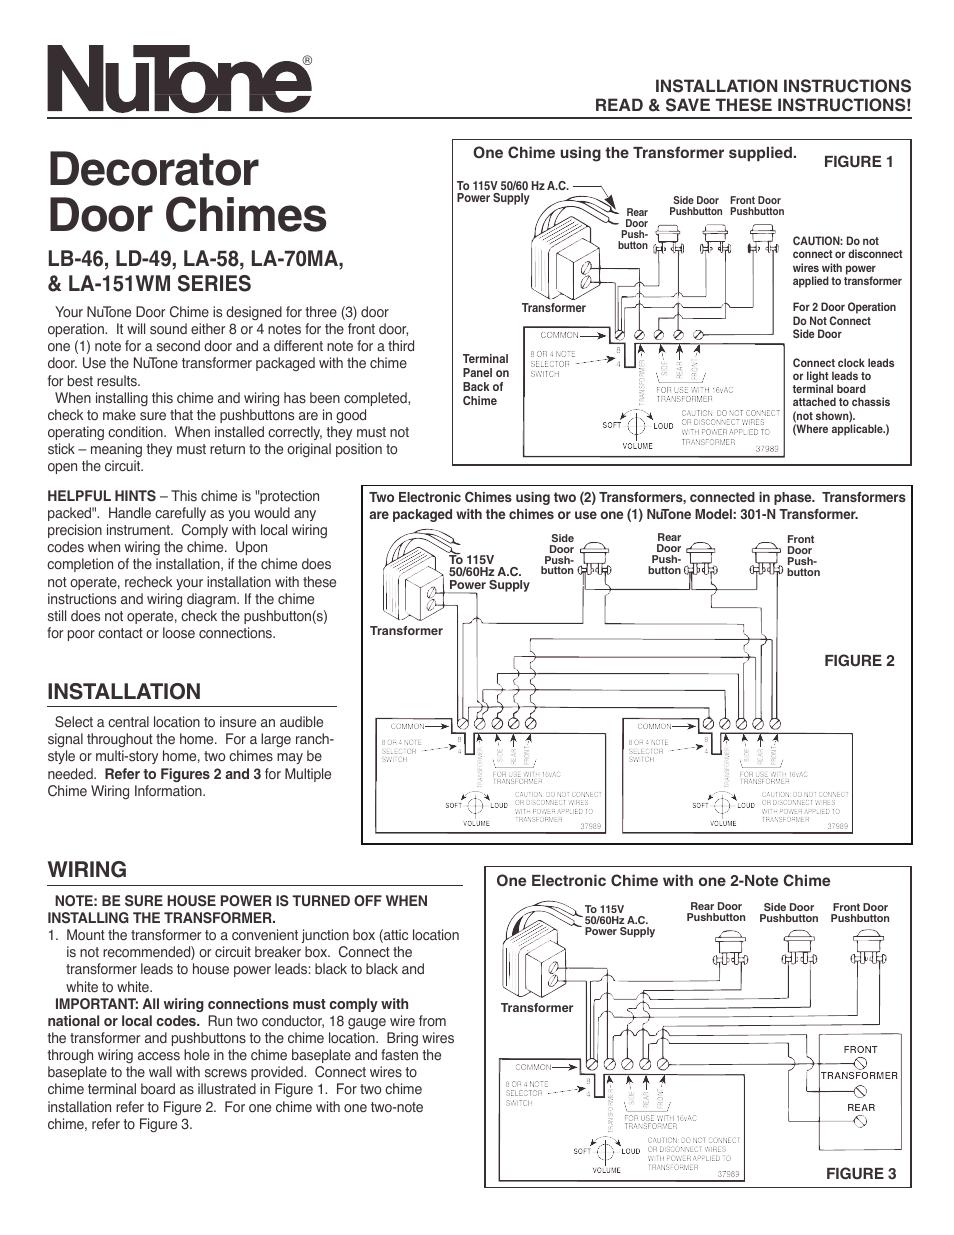 nutone decorator door chimes la 58 page1?resize\\\\\\\\\\\\\\\\\\\\\\\\\\\\\\\\\\\\\\\\\\\\\\\\\\\=665%2C861 ring doorbell wiring diagram doorbell transformer diagram \u2022 wiring Doorbell Wiring-Diagram Two Chimes at mifinder.co